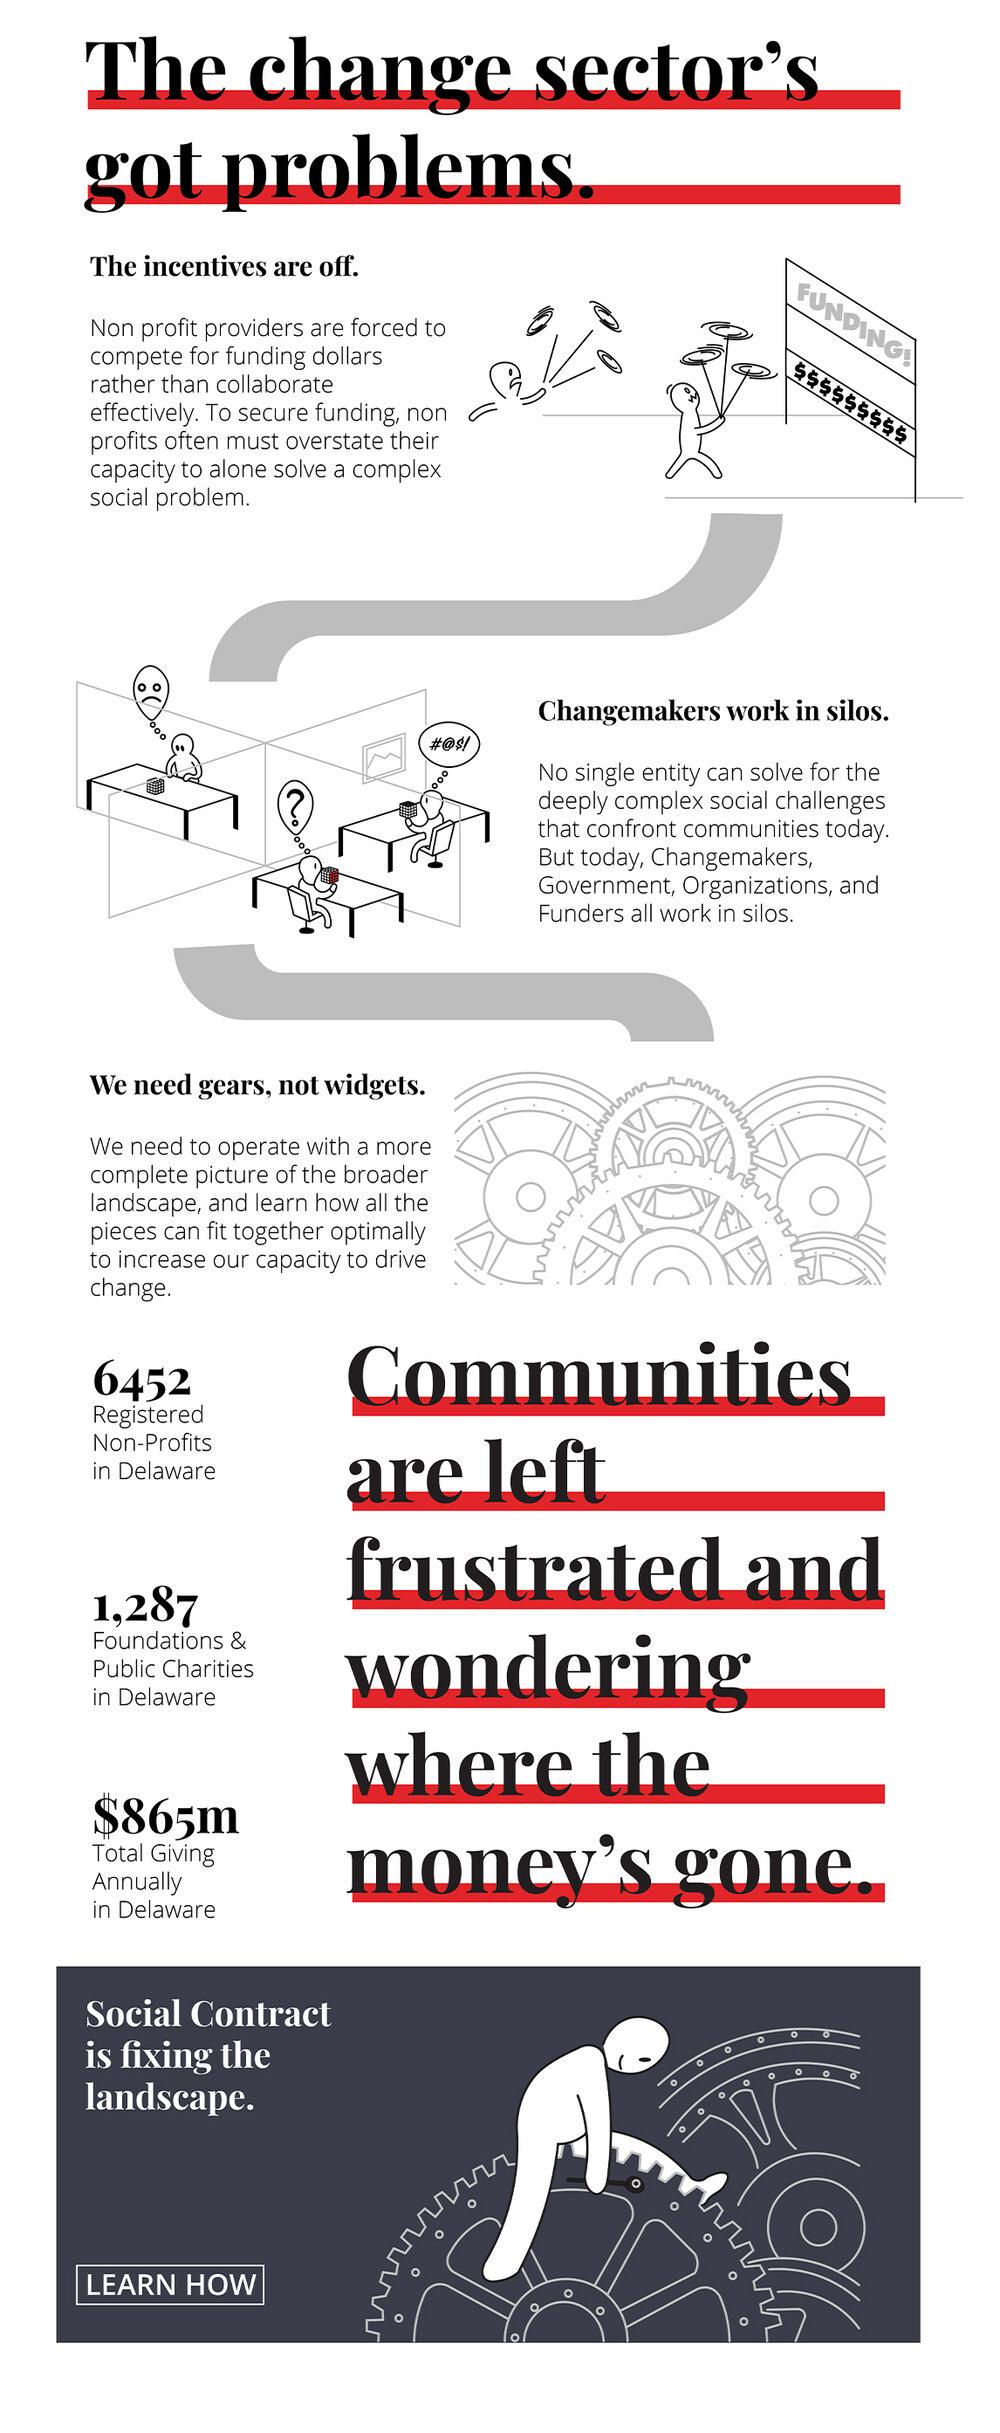 Change Sector Problems Infographic_v2.jpg